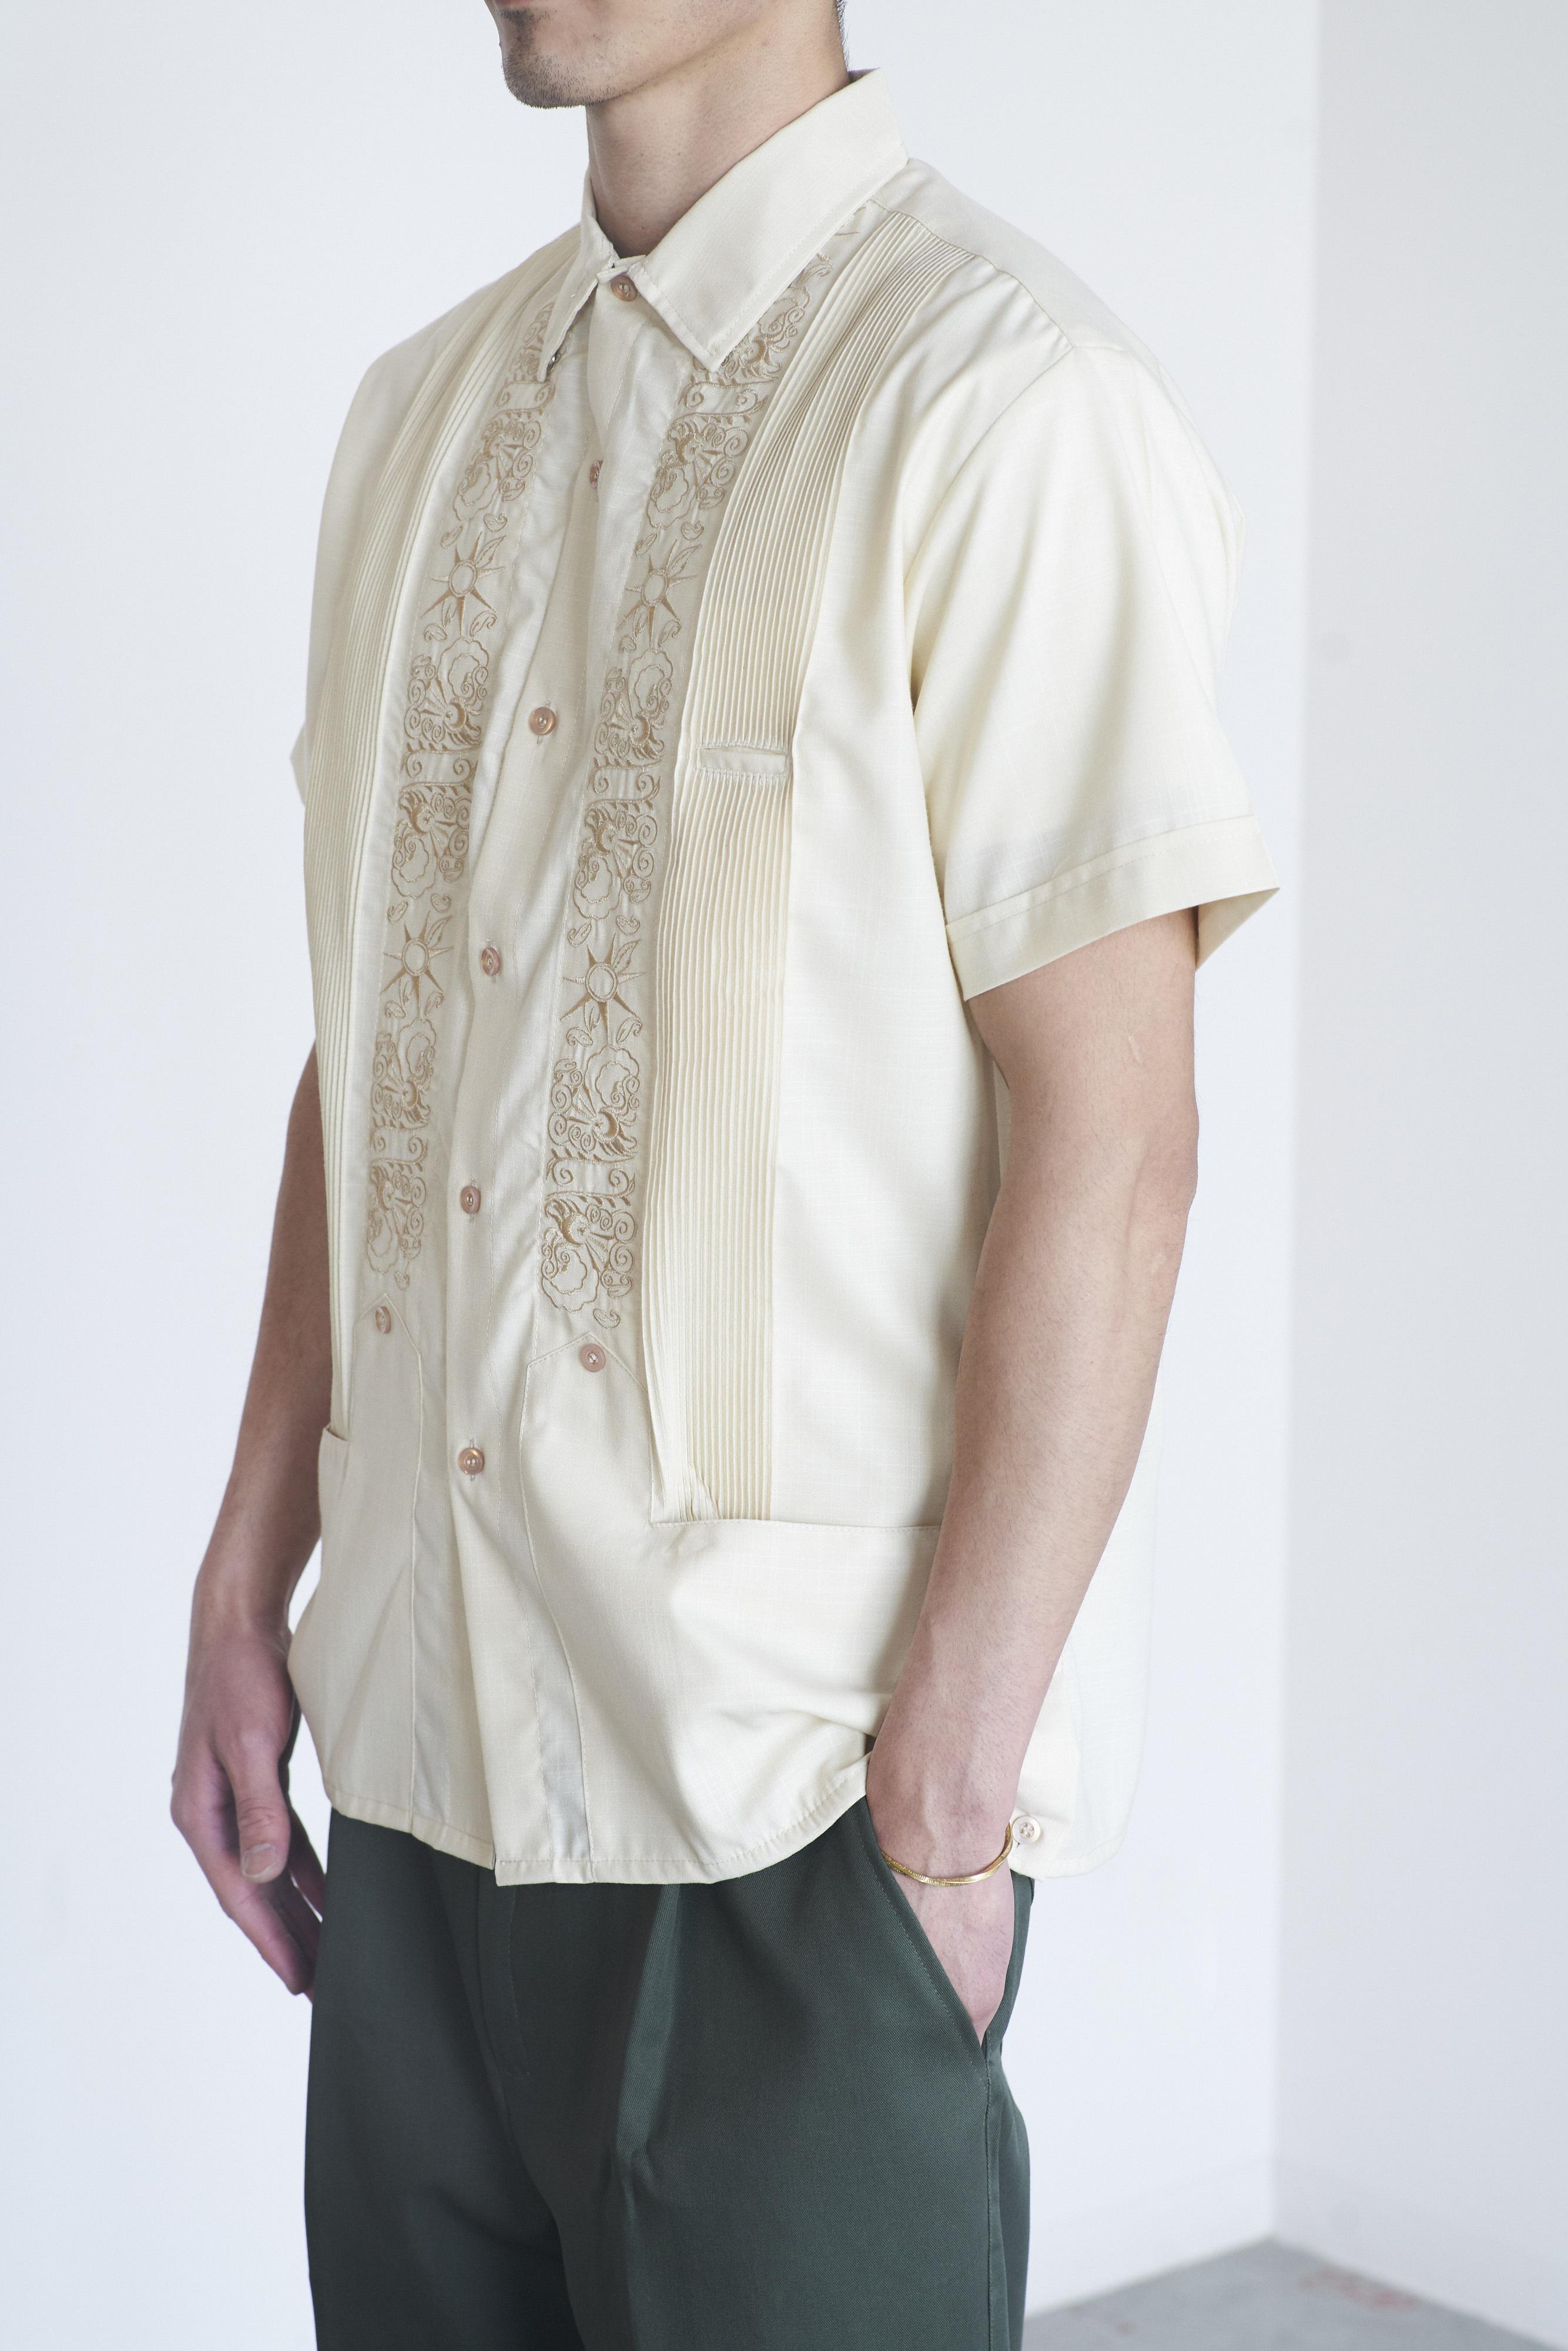 BARNSTORMER Y.A.BERA short sleeve キューバシャツ